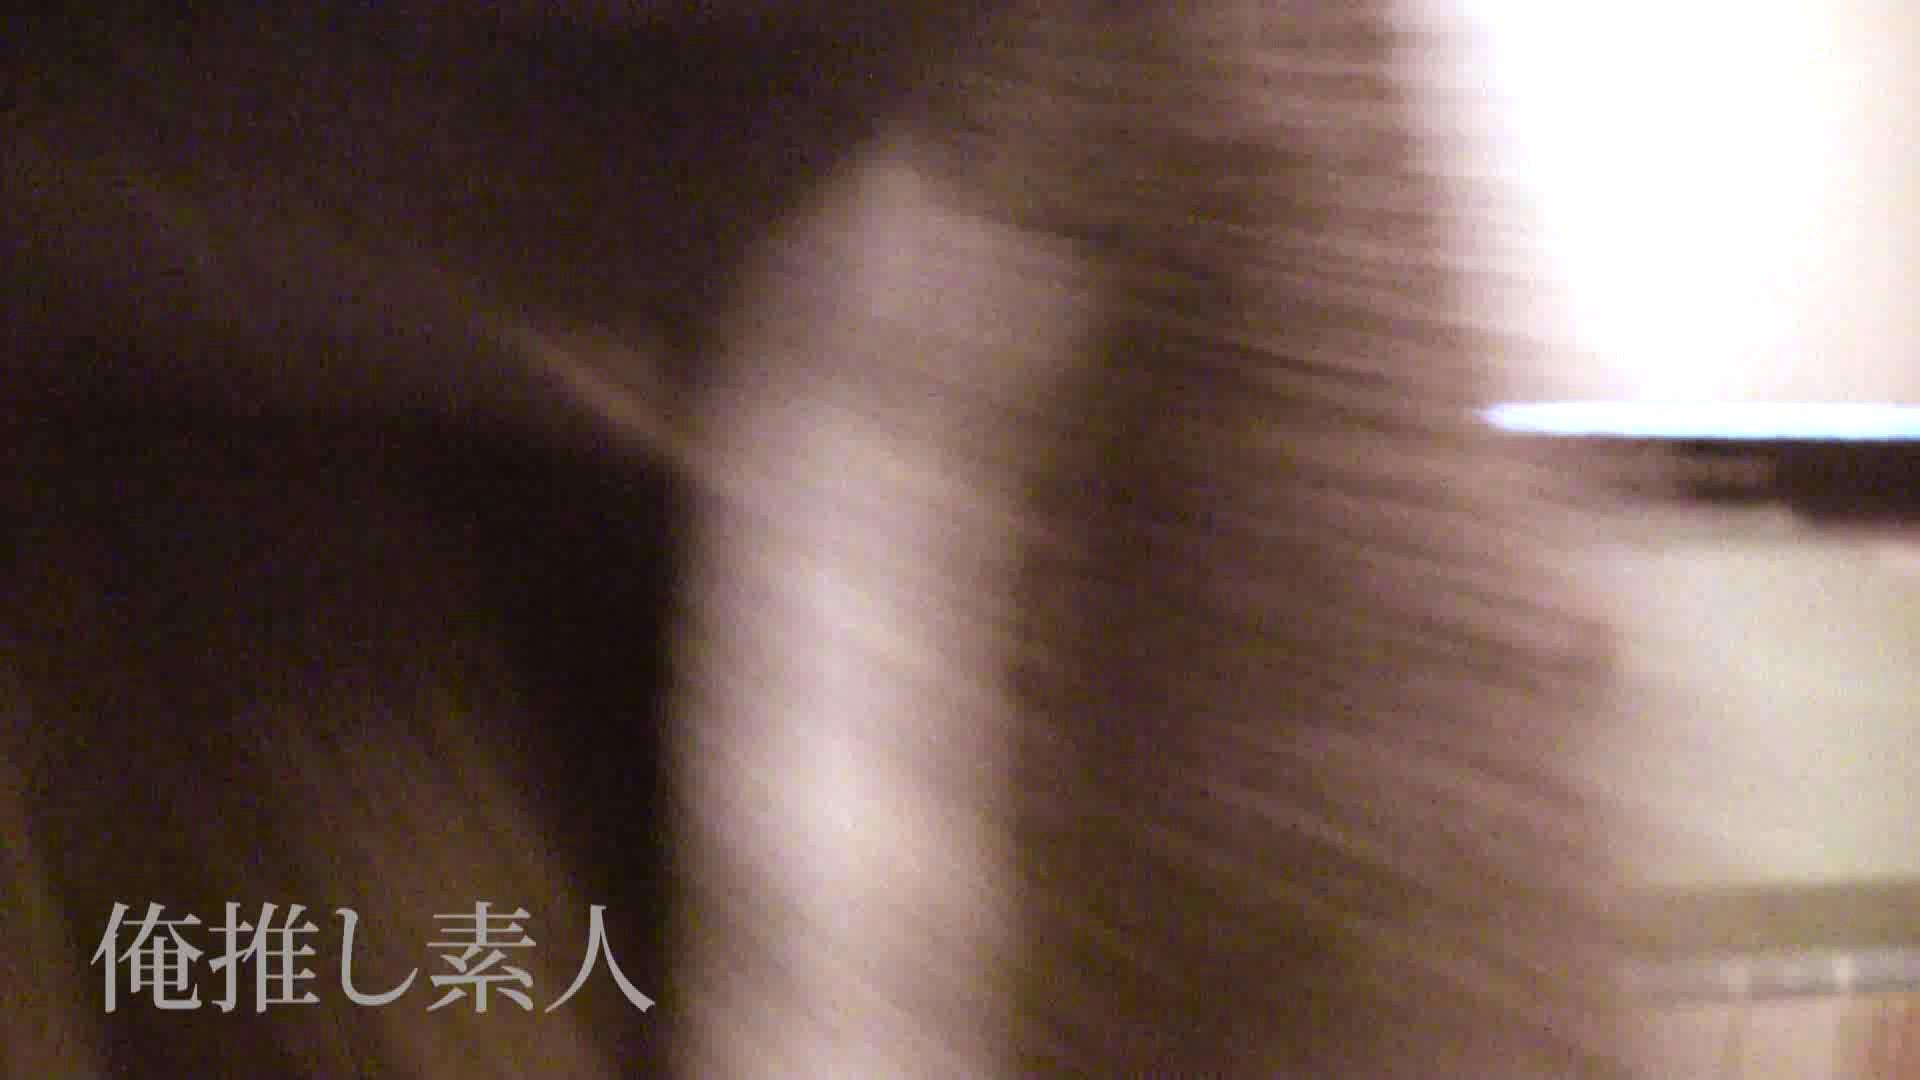 俺推し素人 30代人妻熟女キャバ嬢雫Vol.02 素人丸裸 性交動画流出 69pic 57